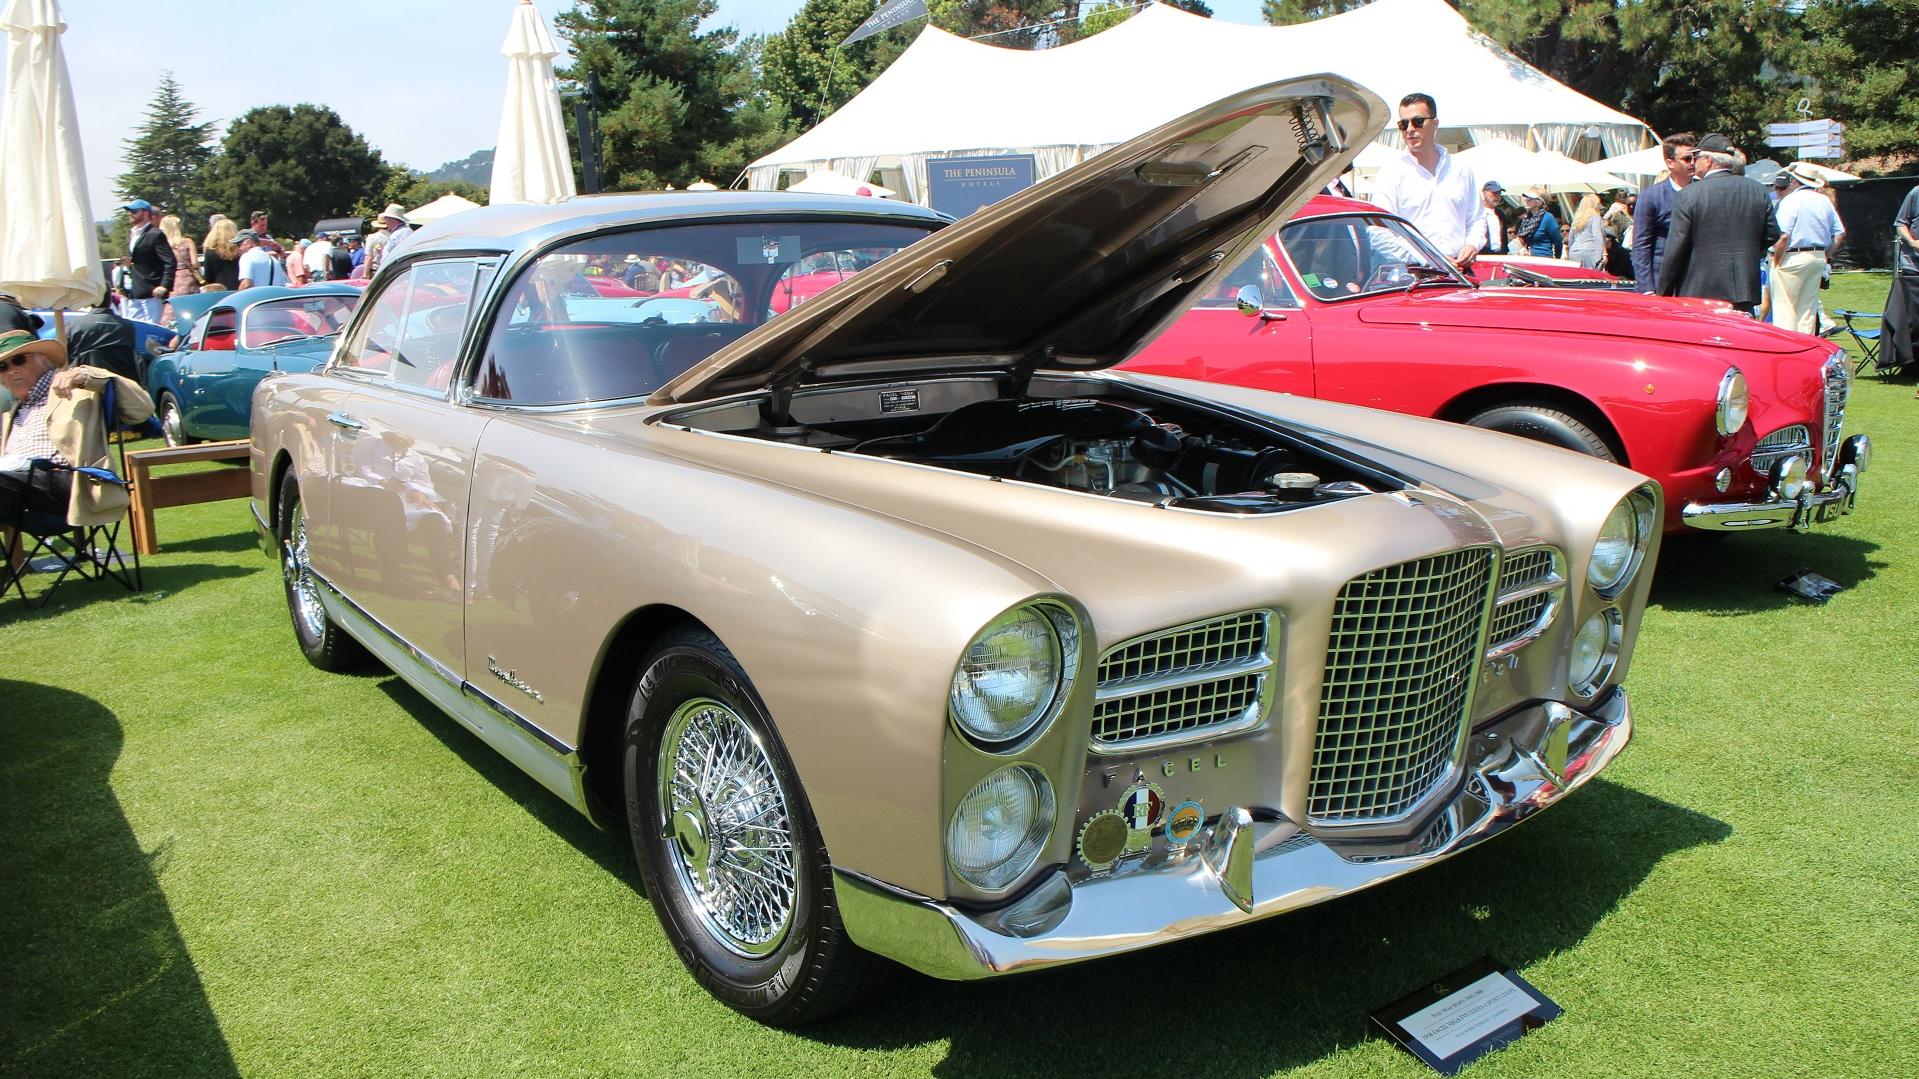 1958 Facel Vegas FVS Series 4 Sport Coupe, The Quail, 2017 Monterey Car Week